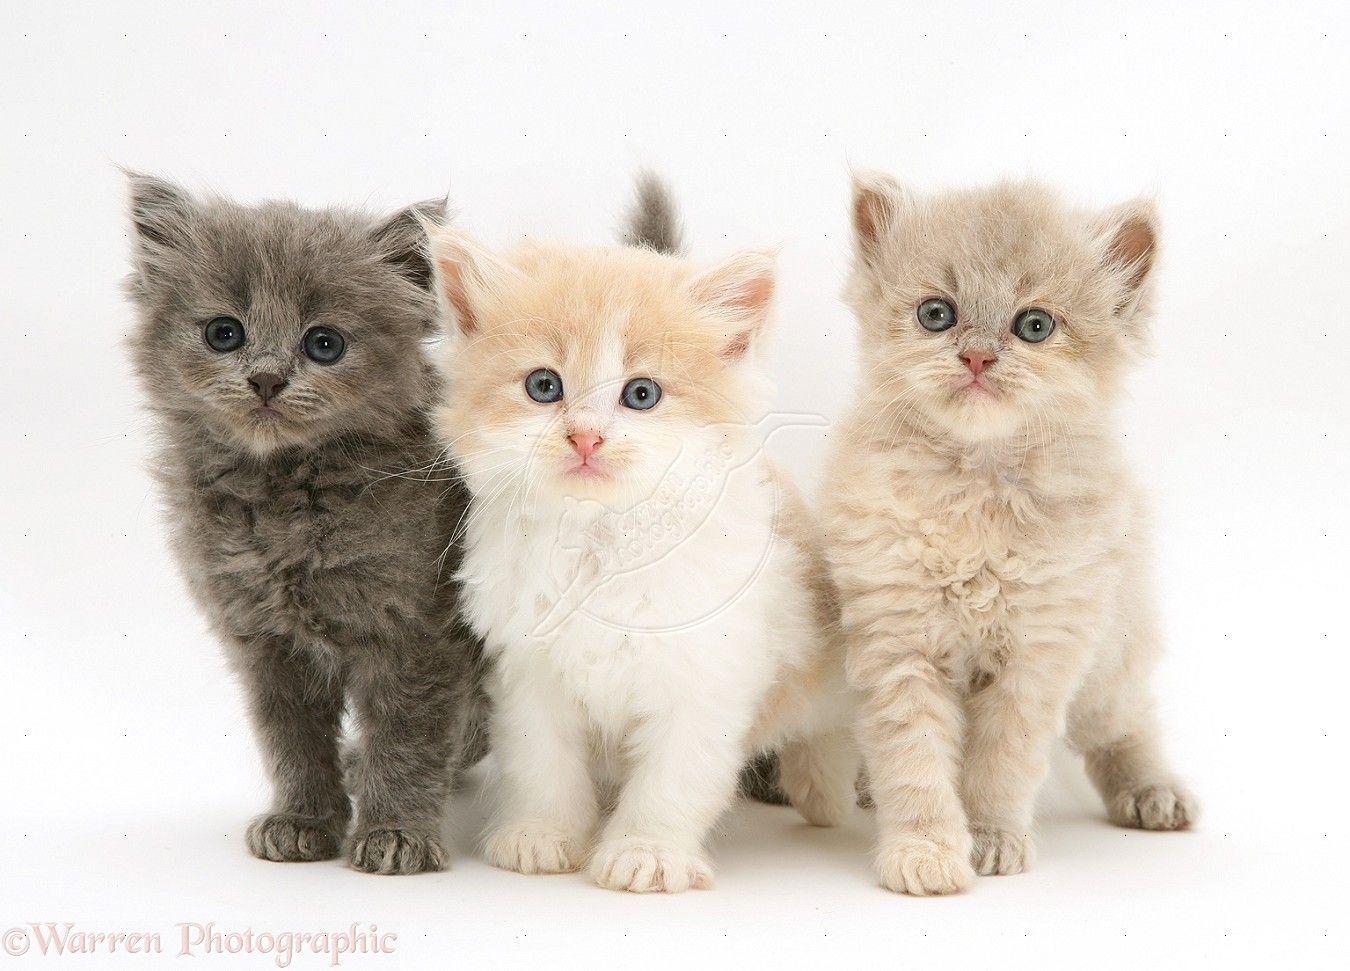 3 Little Kittens Kittens Cutest Cute Baby Cats Baby Cats